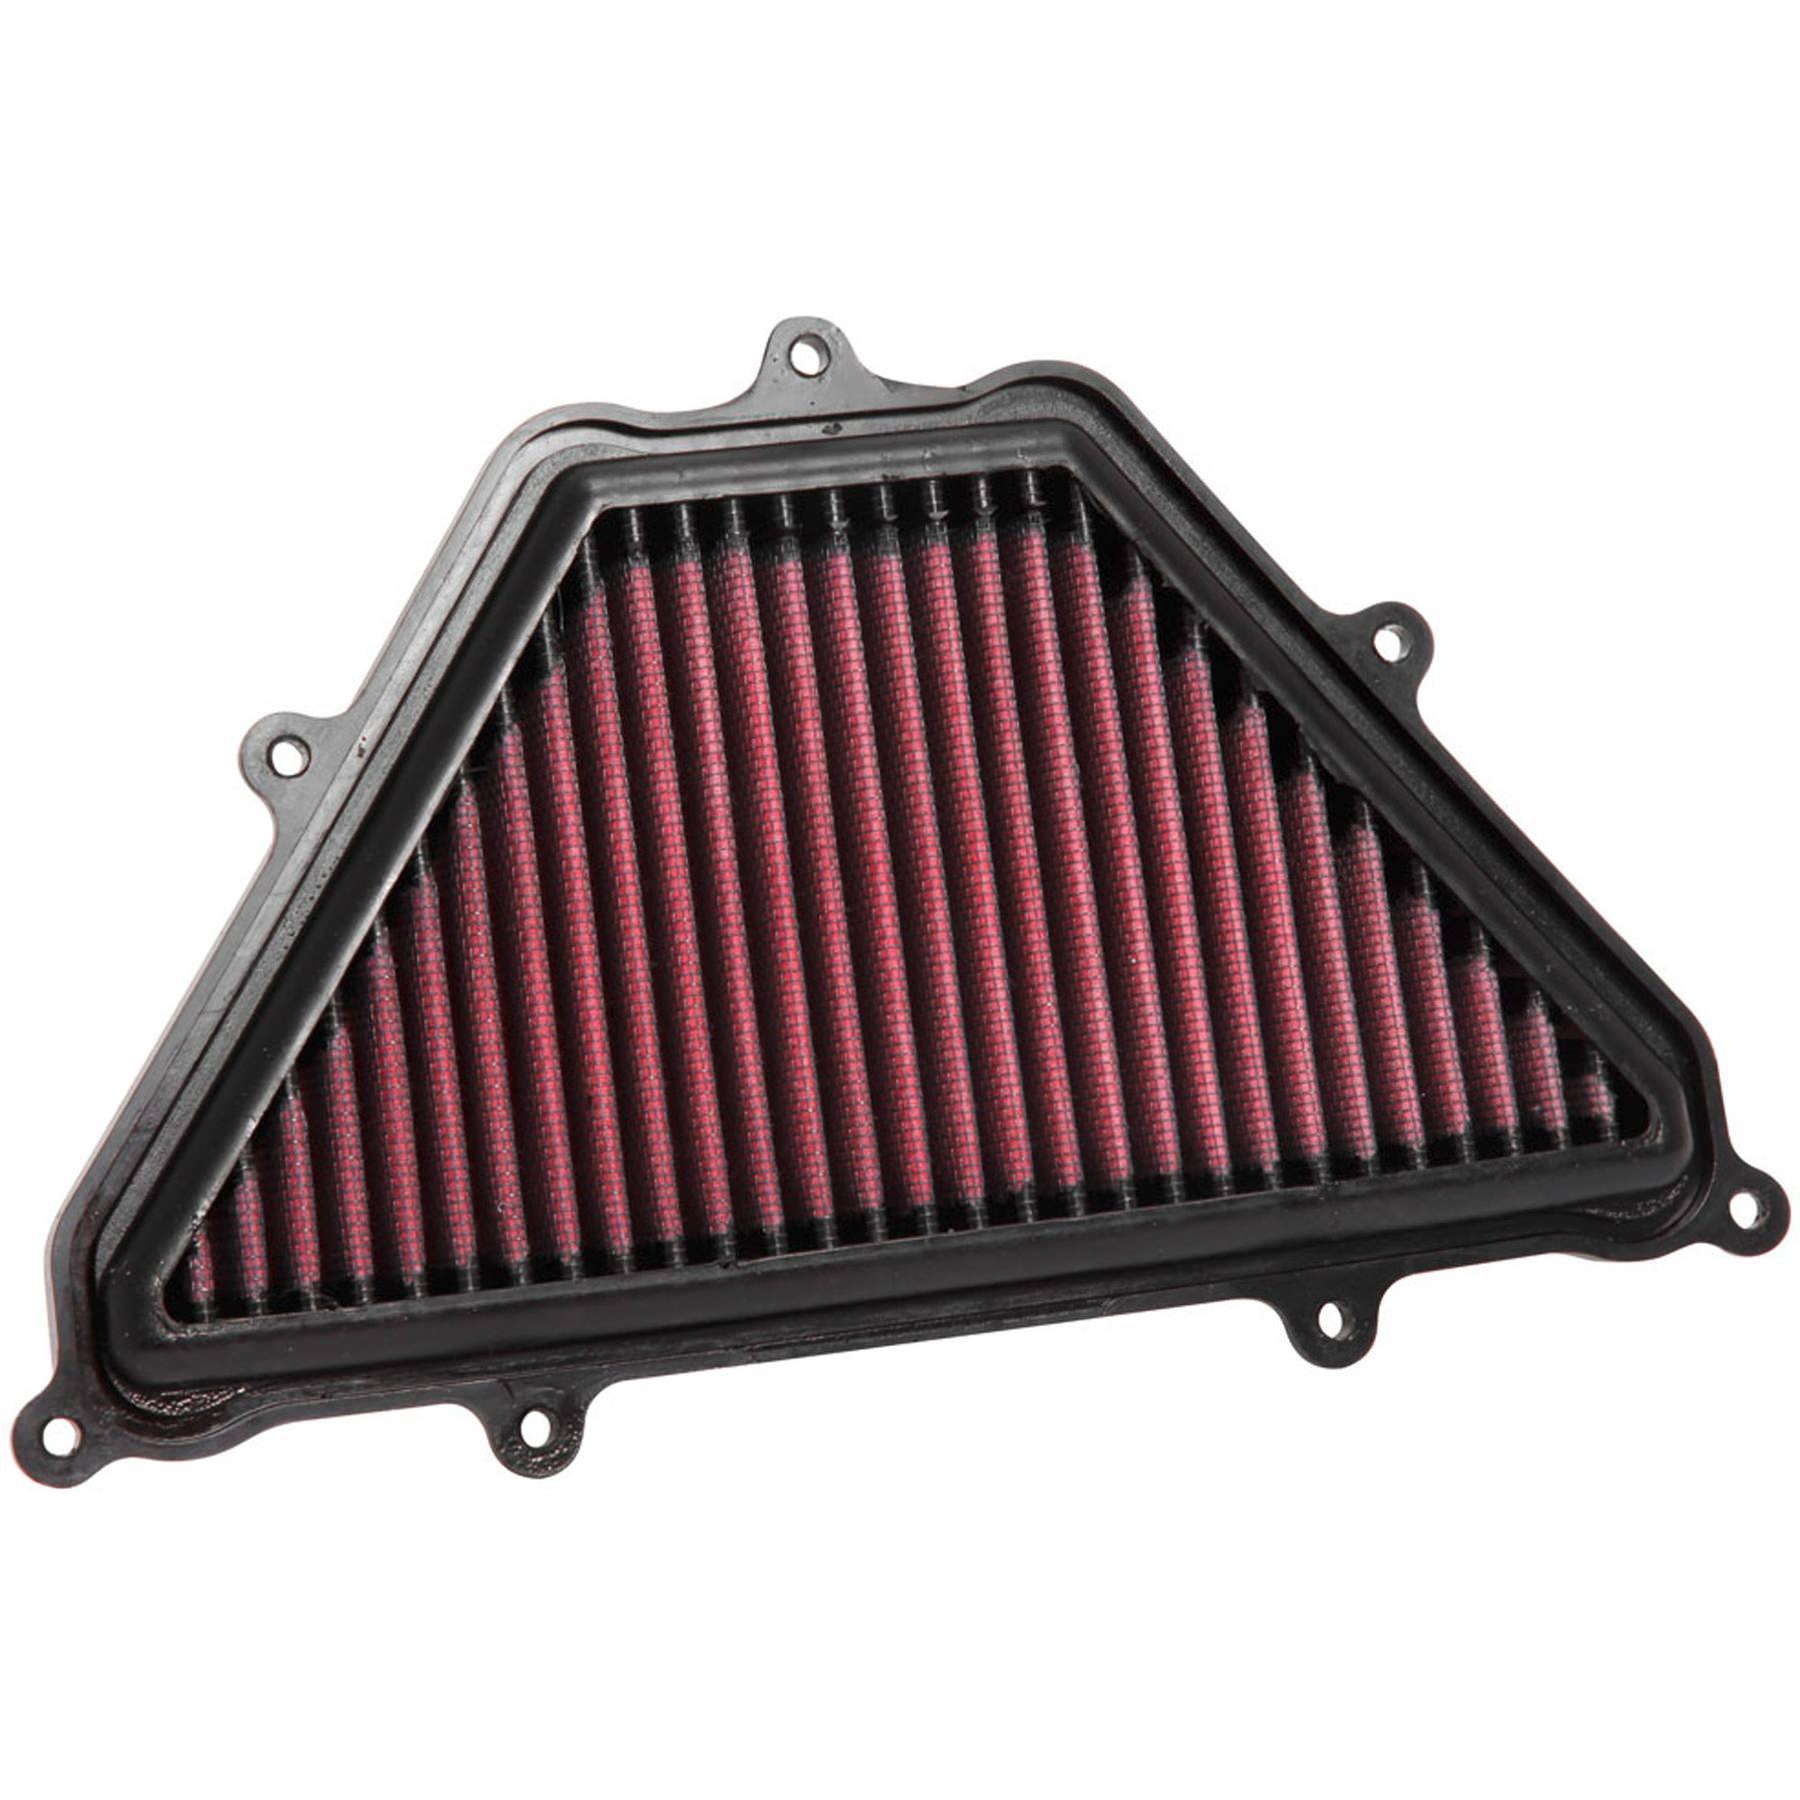 YA-1699 K/&N Air Filter FOR YAMAHA XV1600 WILD STAR 1600